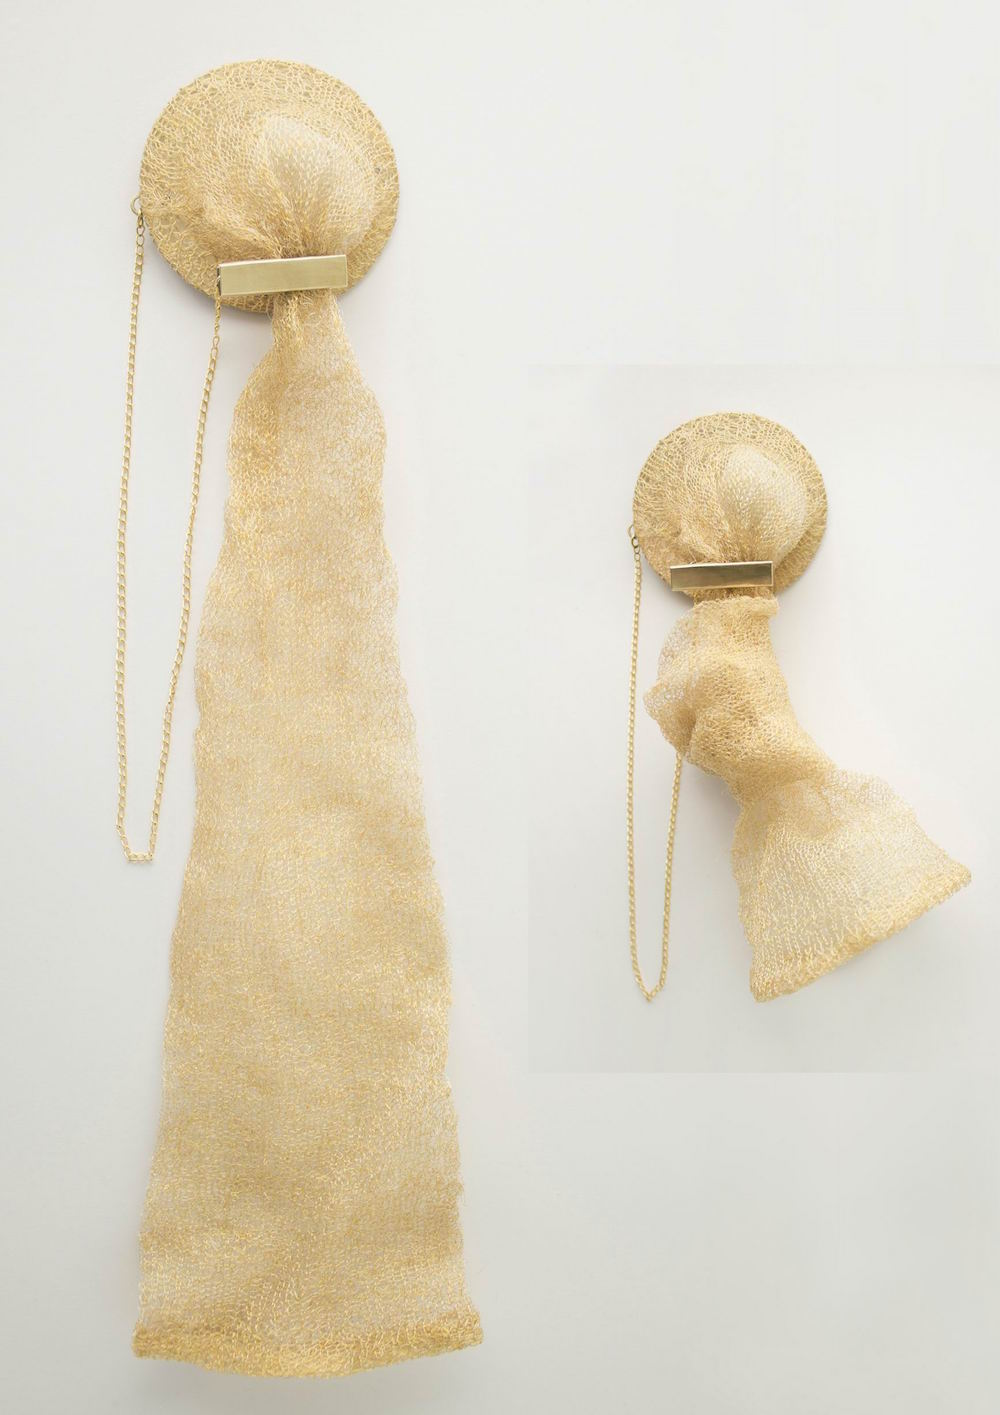 Holder Brooch 1 by BA (Hons) Fashion Jewellery graduate Suinan Li.